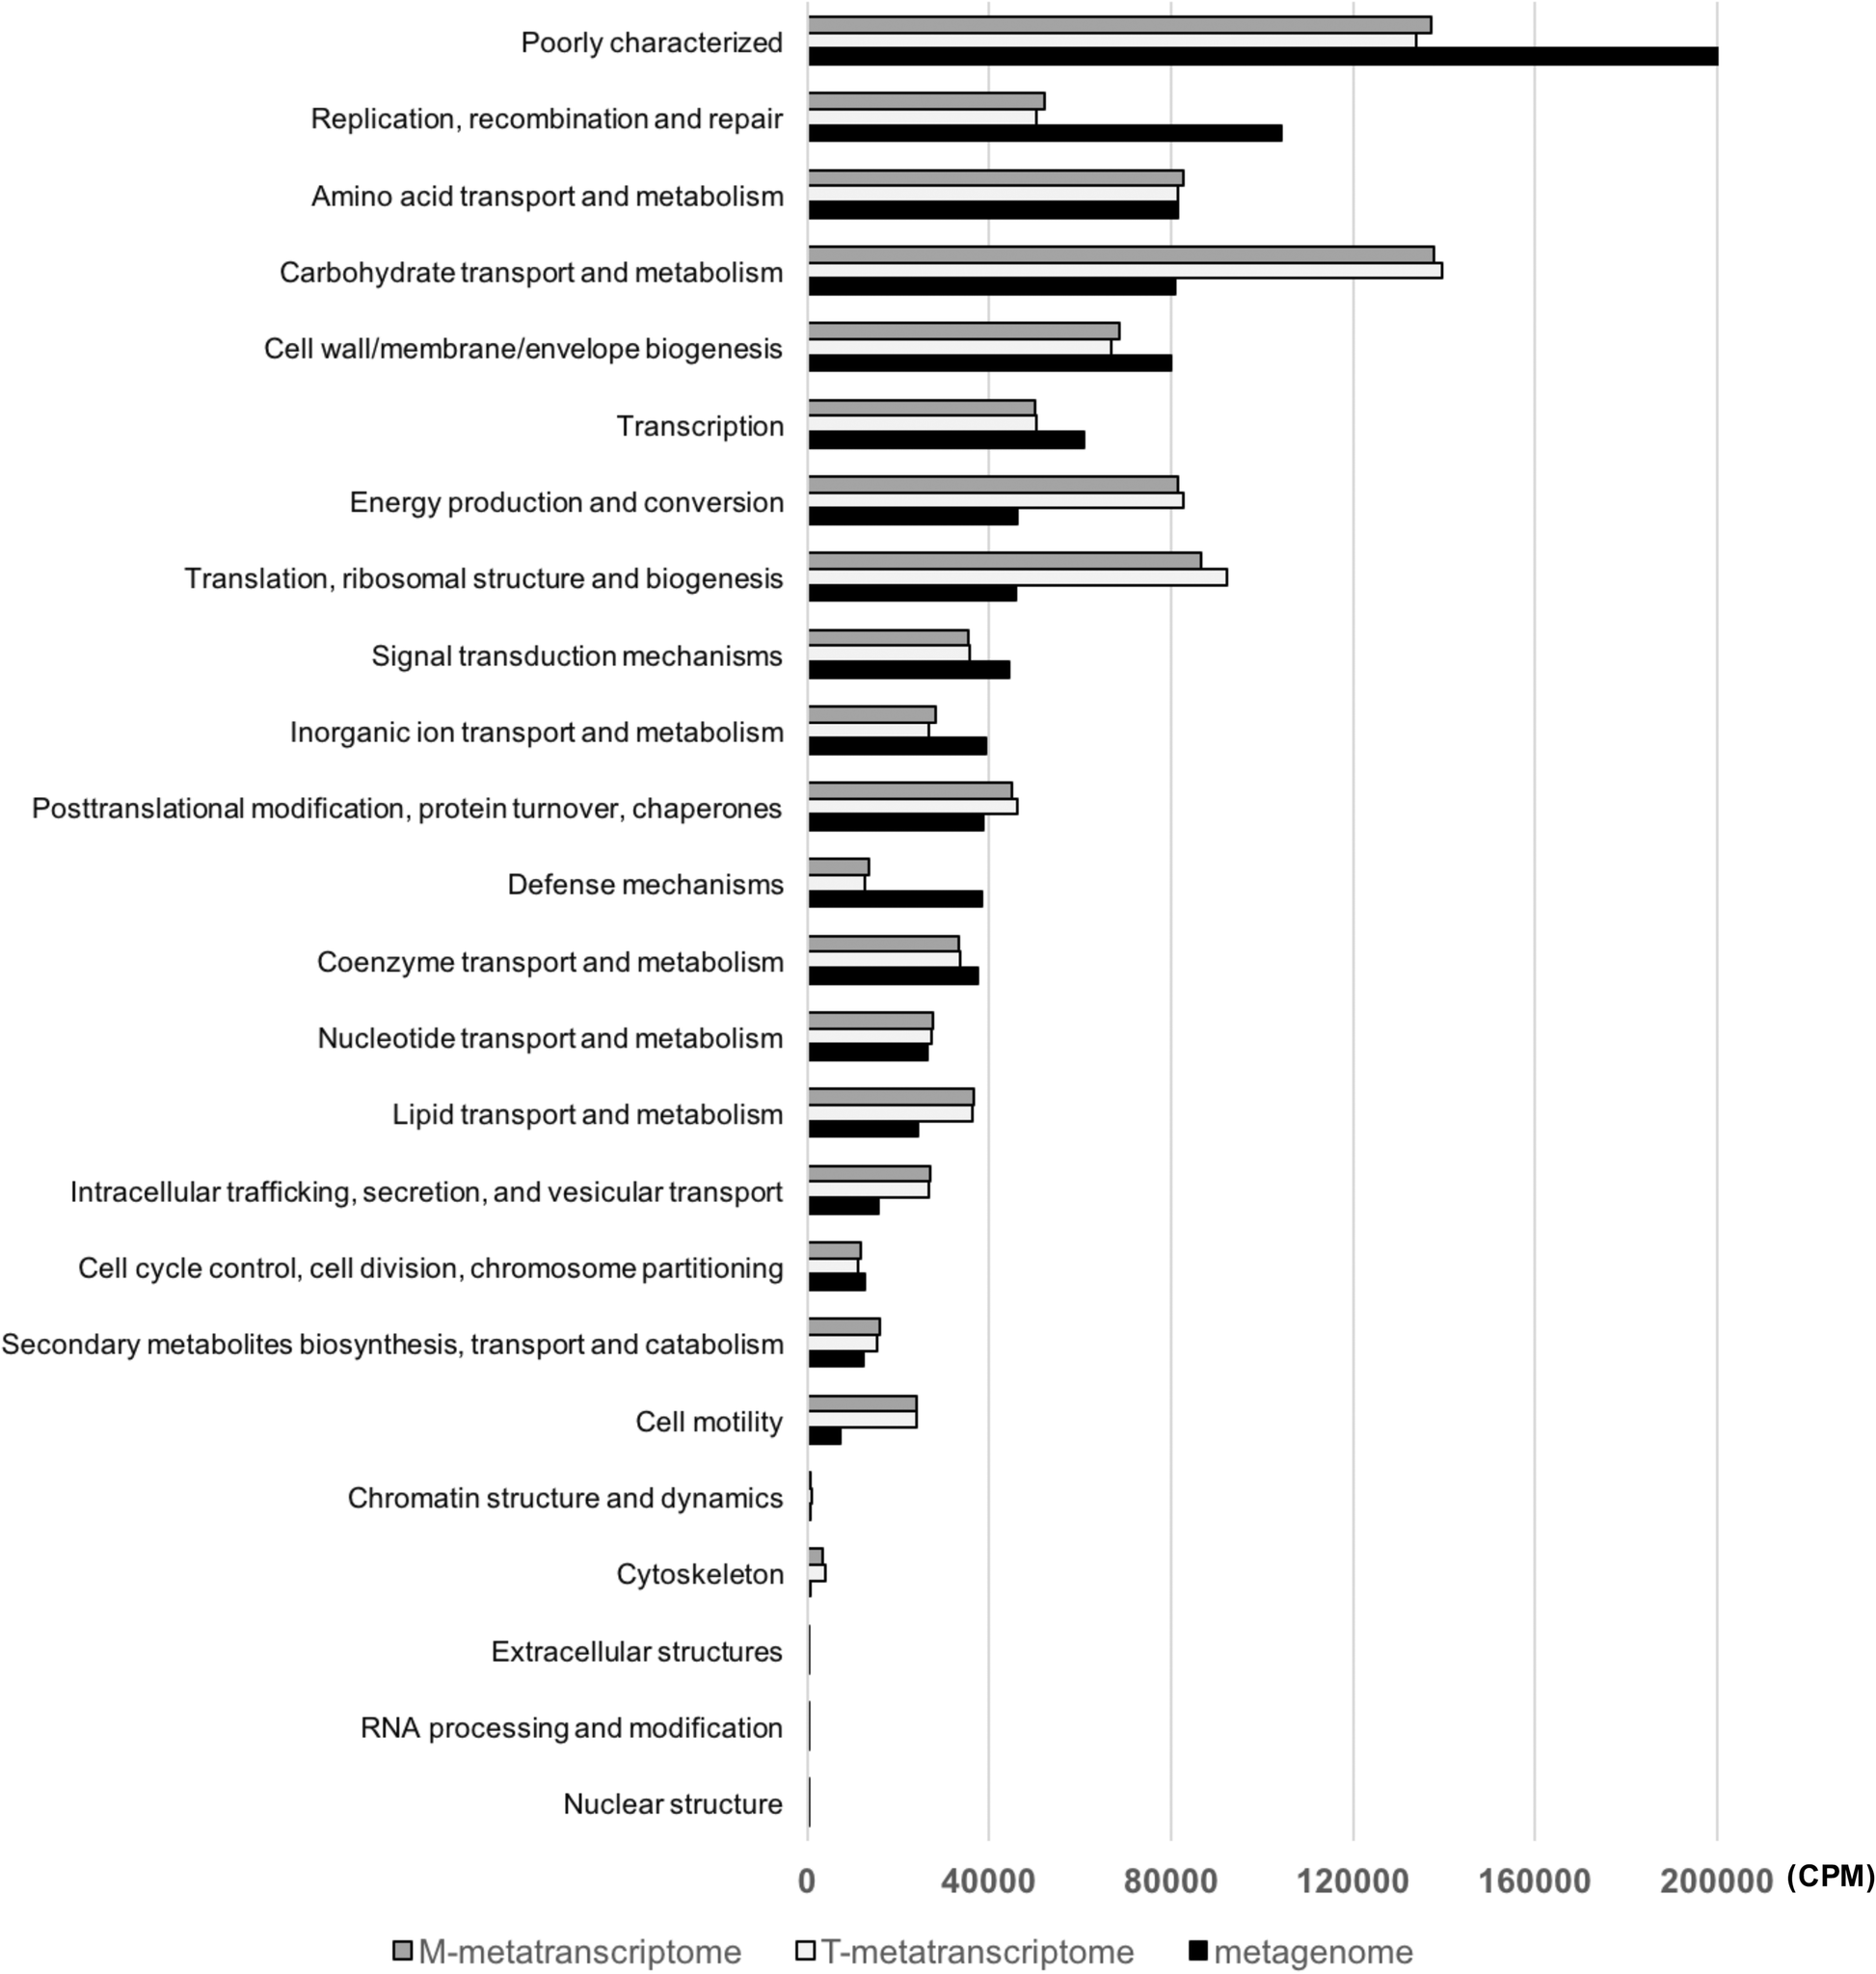 Comparative metagenomic and metatranscriptomic analyses